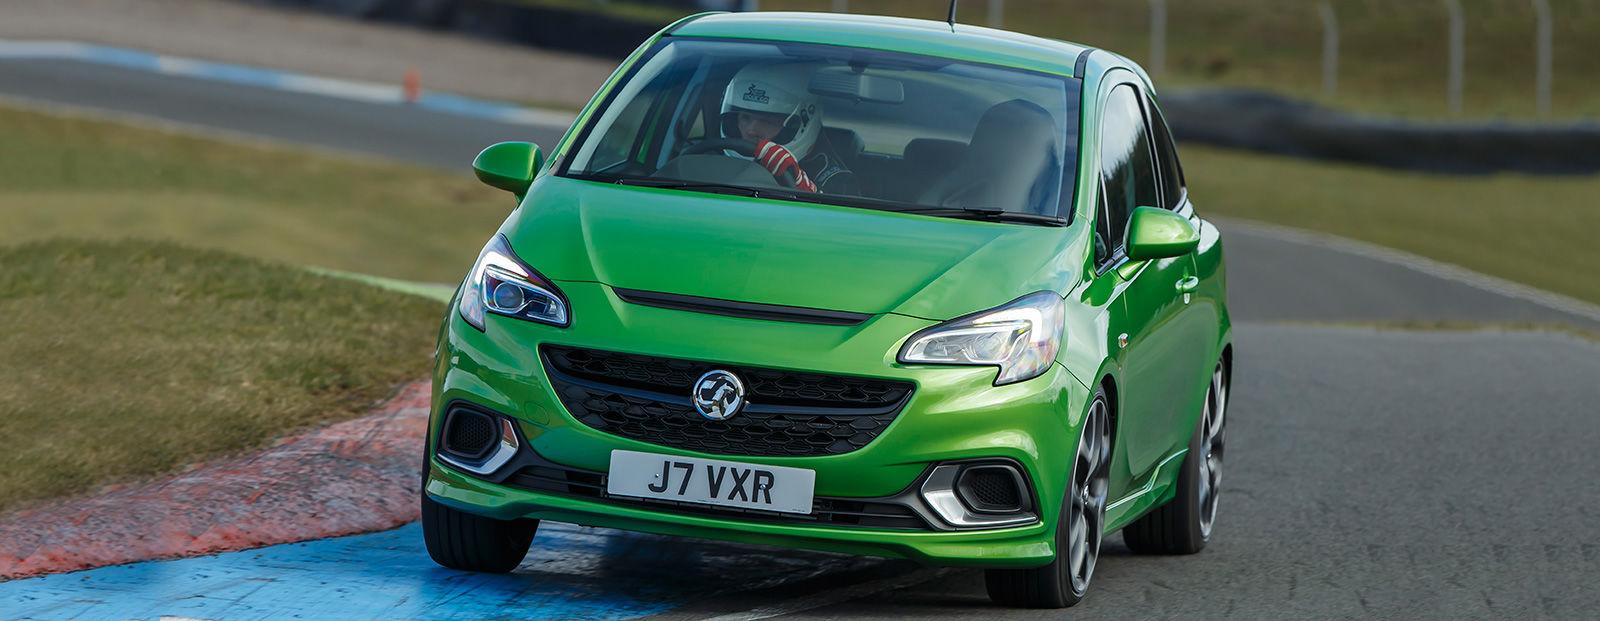 Green car paint colors - Vauxhall Corsa Vxr Lime Green